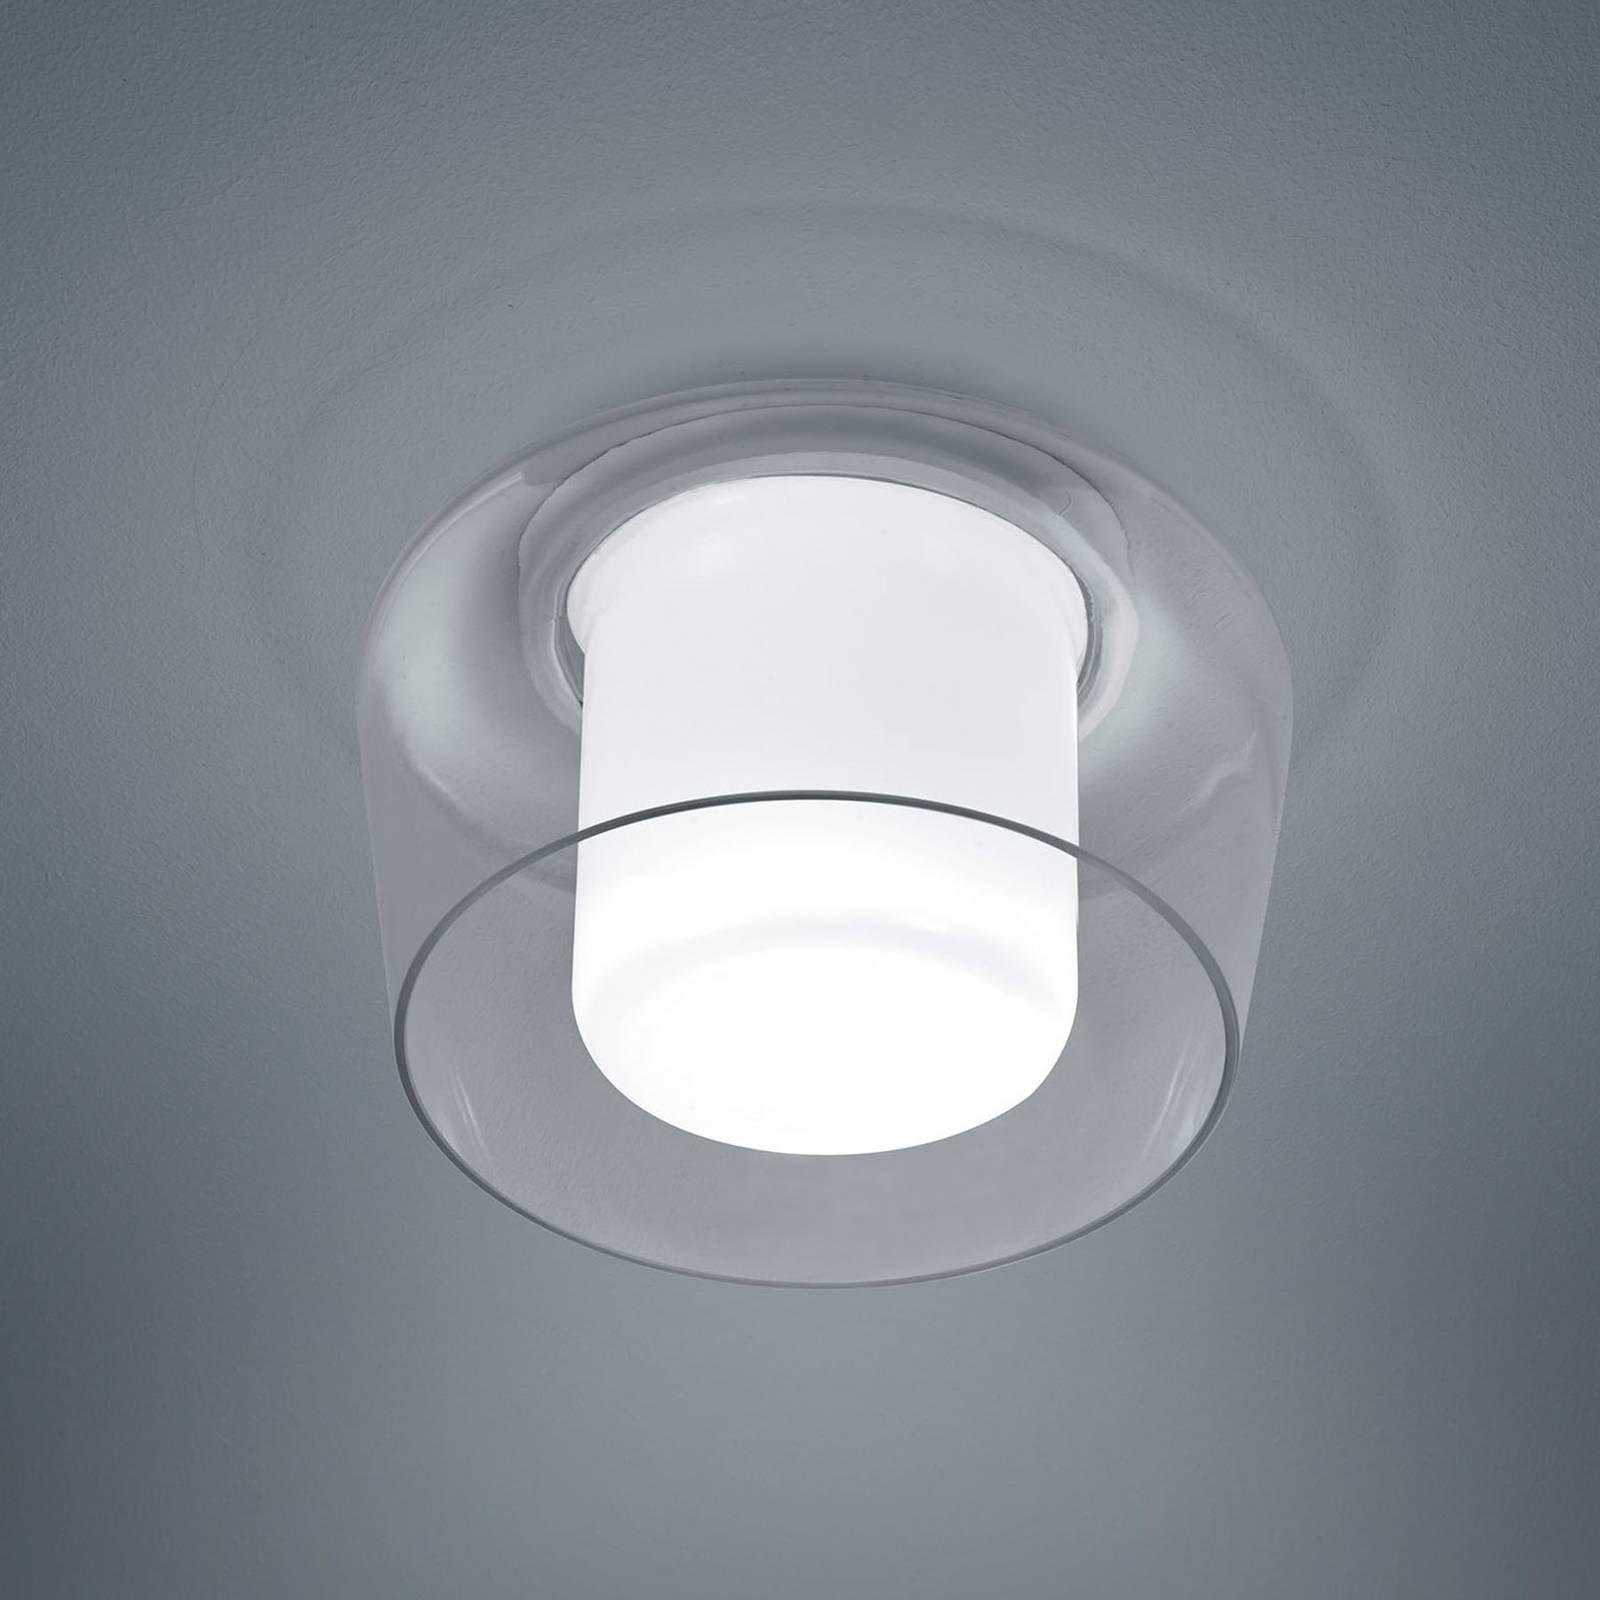 Helestra Canio taklampe av glass, klar utvendig